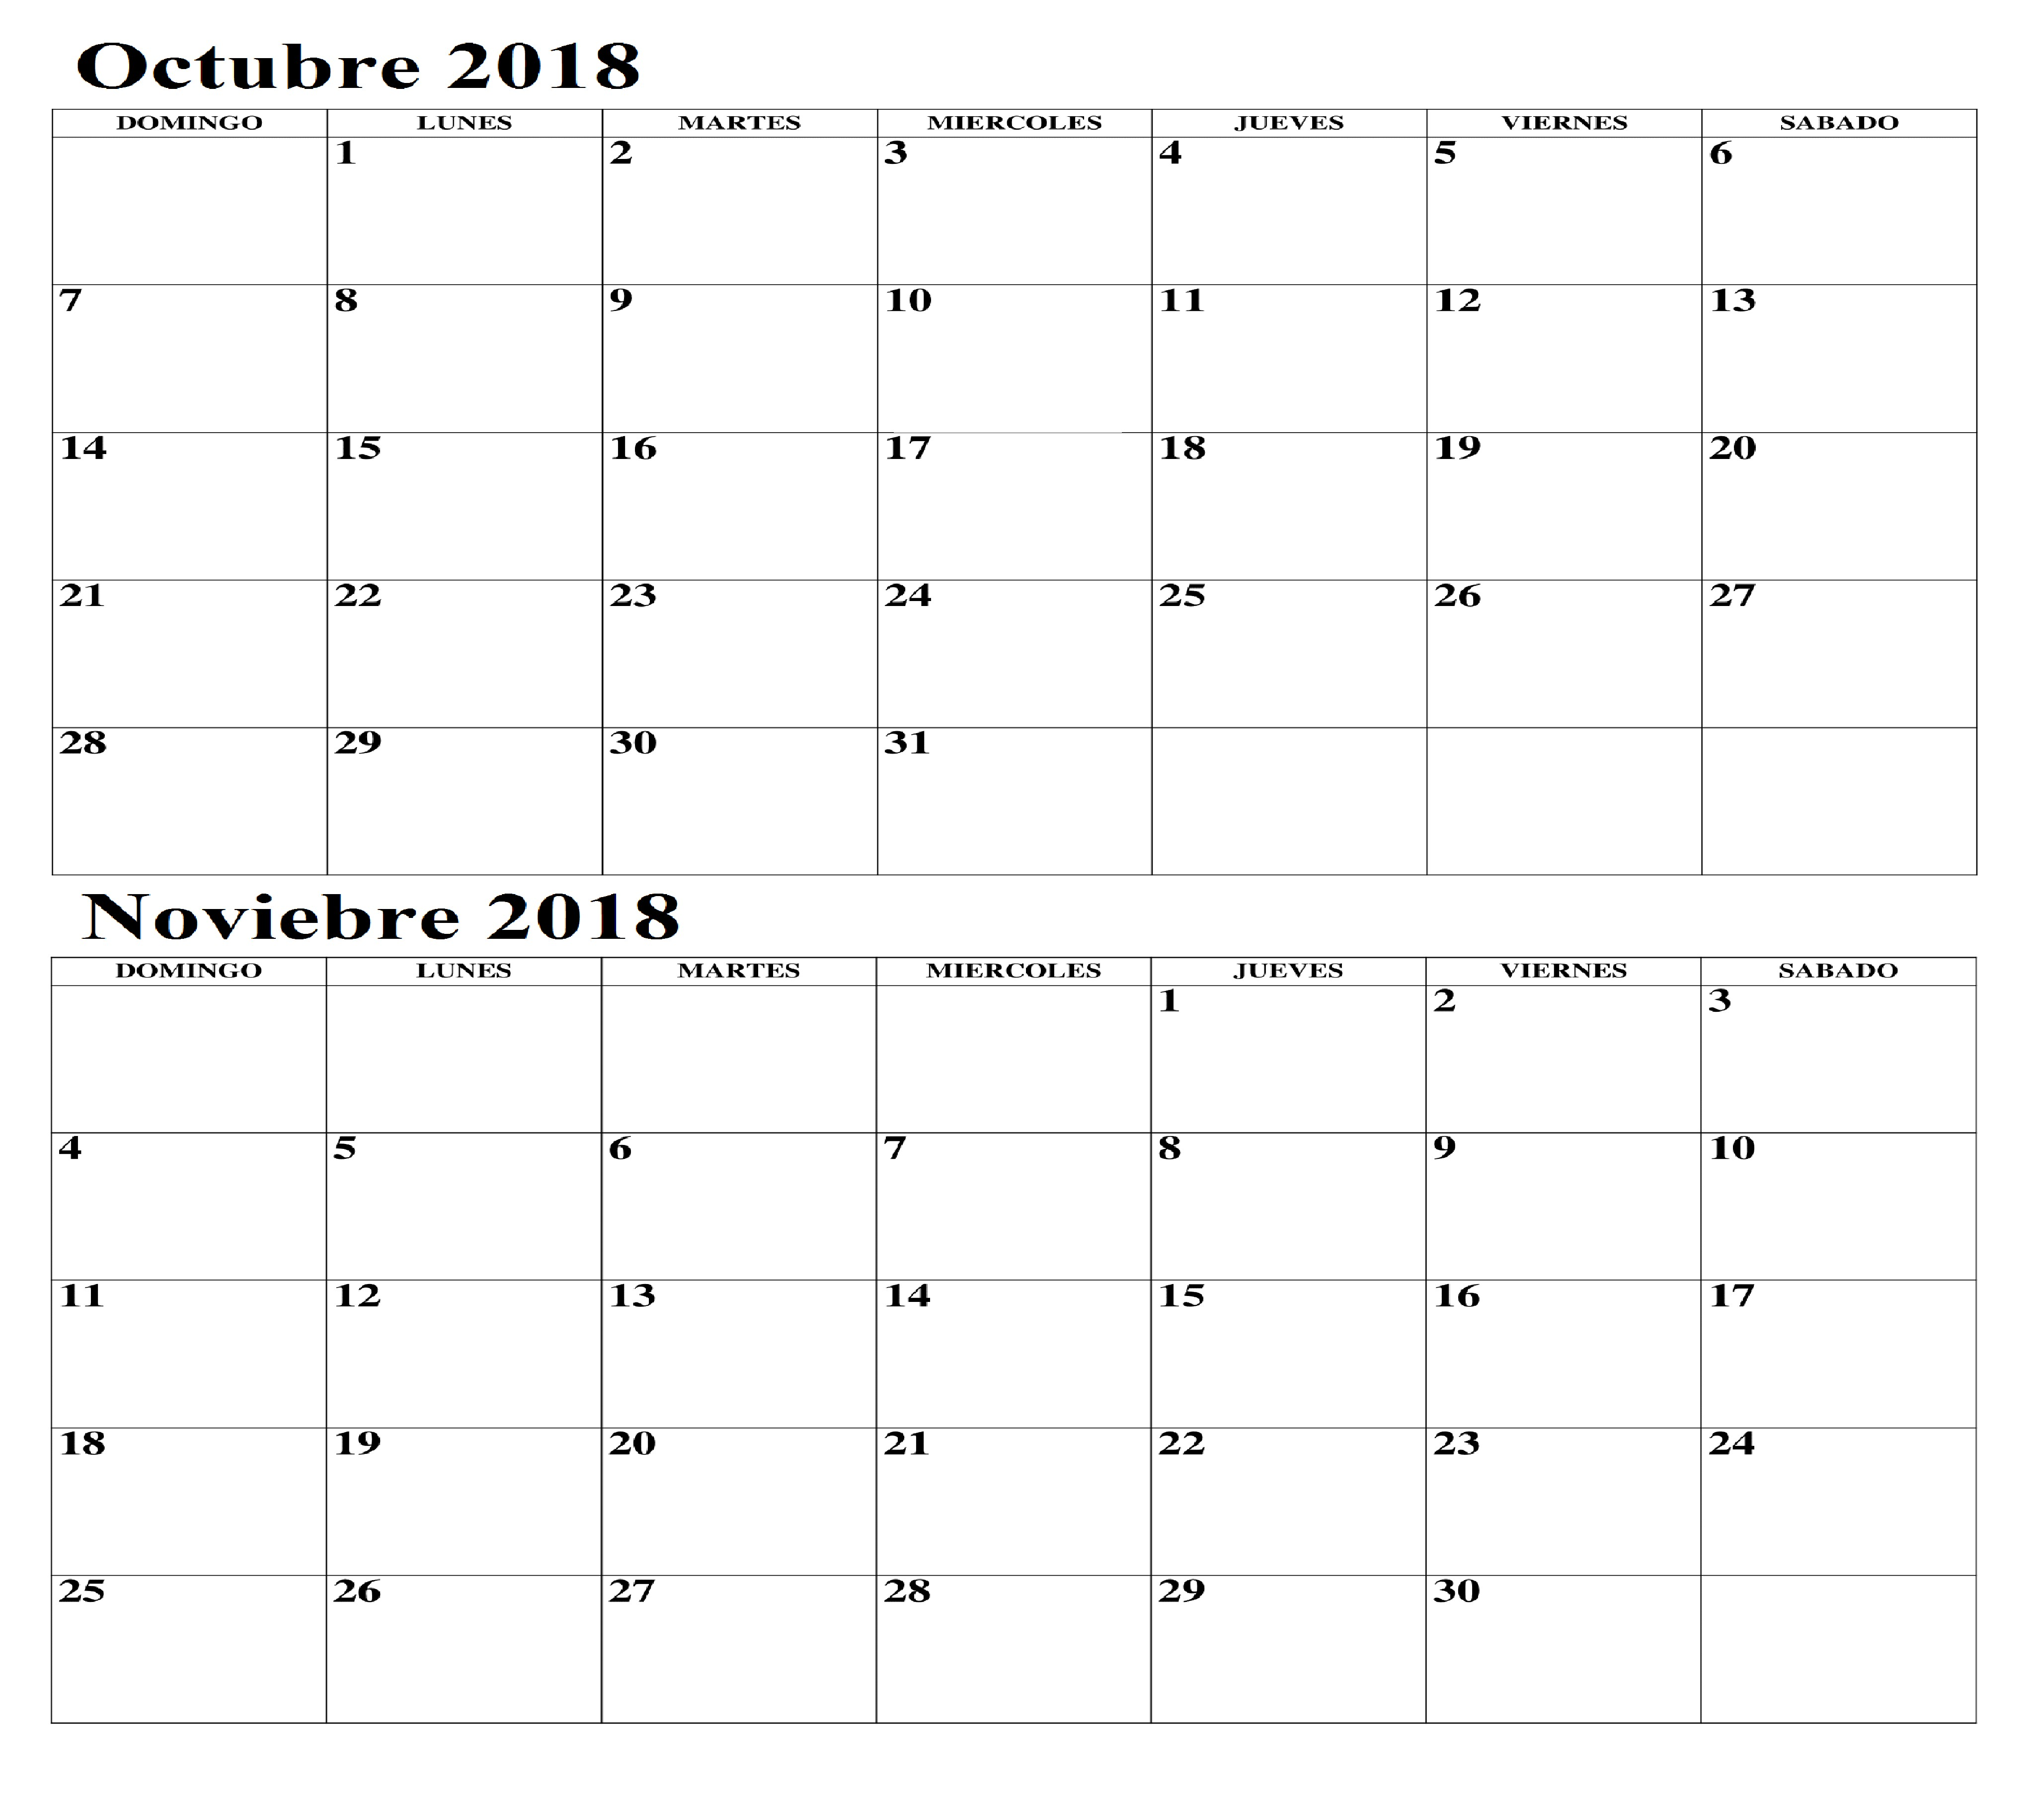 Calendario de octubre 2018 Calendario de octubre 2018 Noviembre